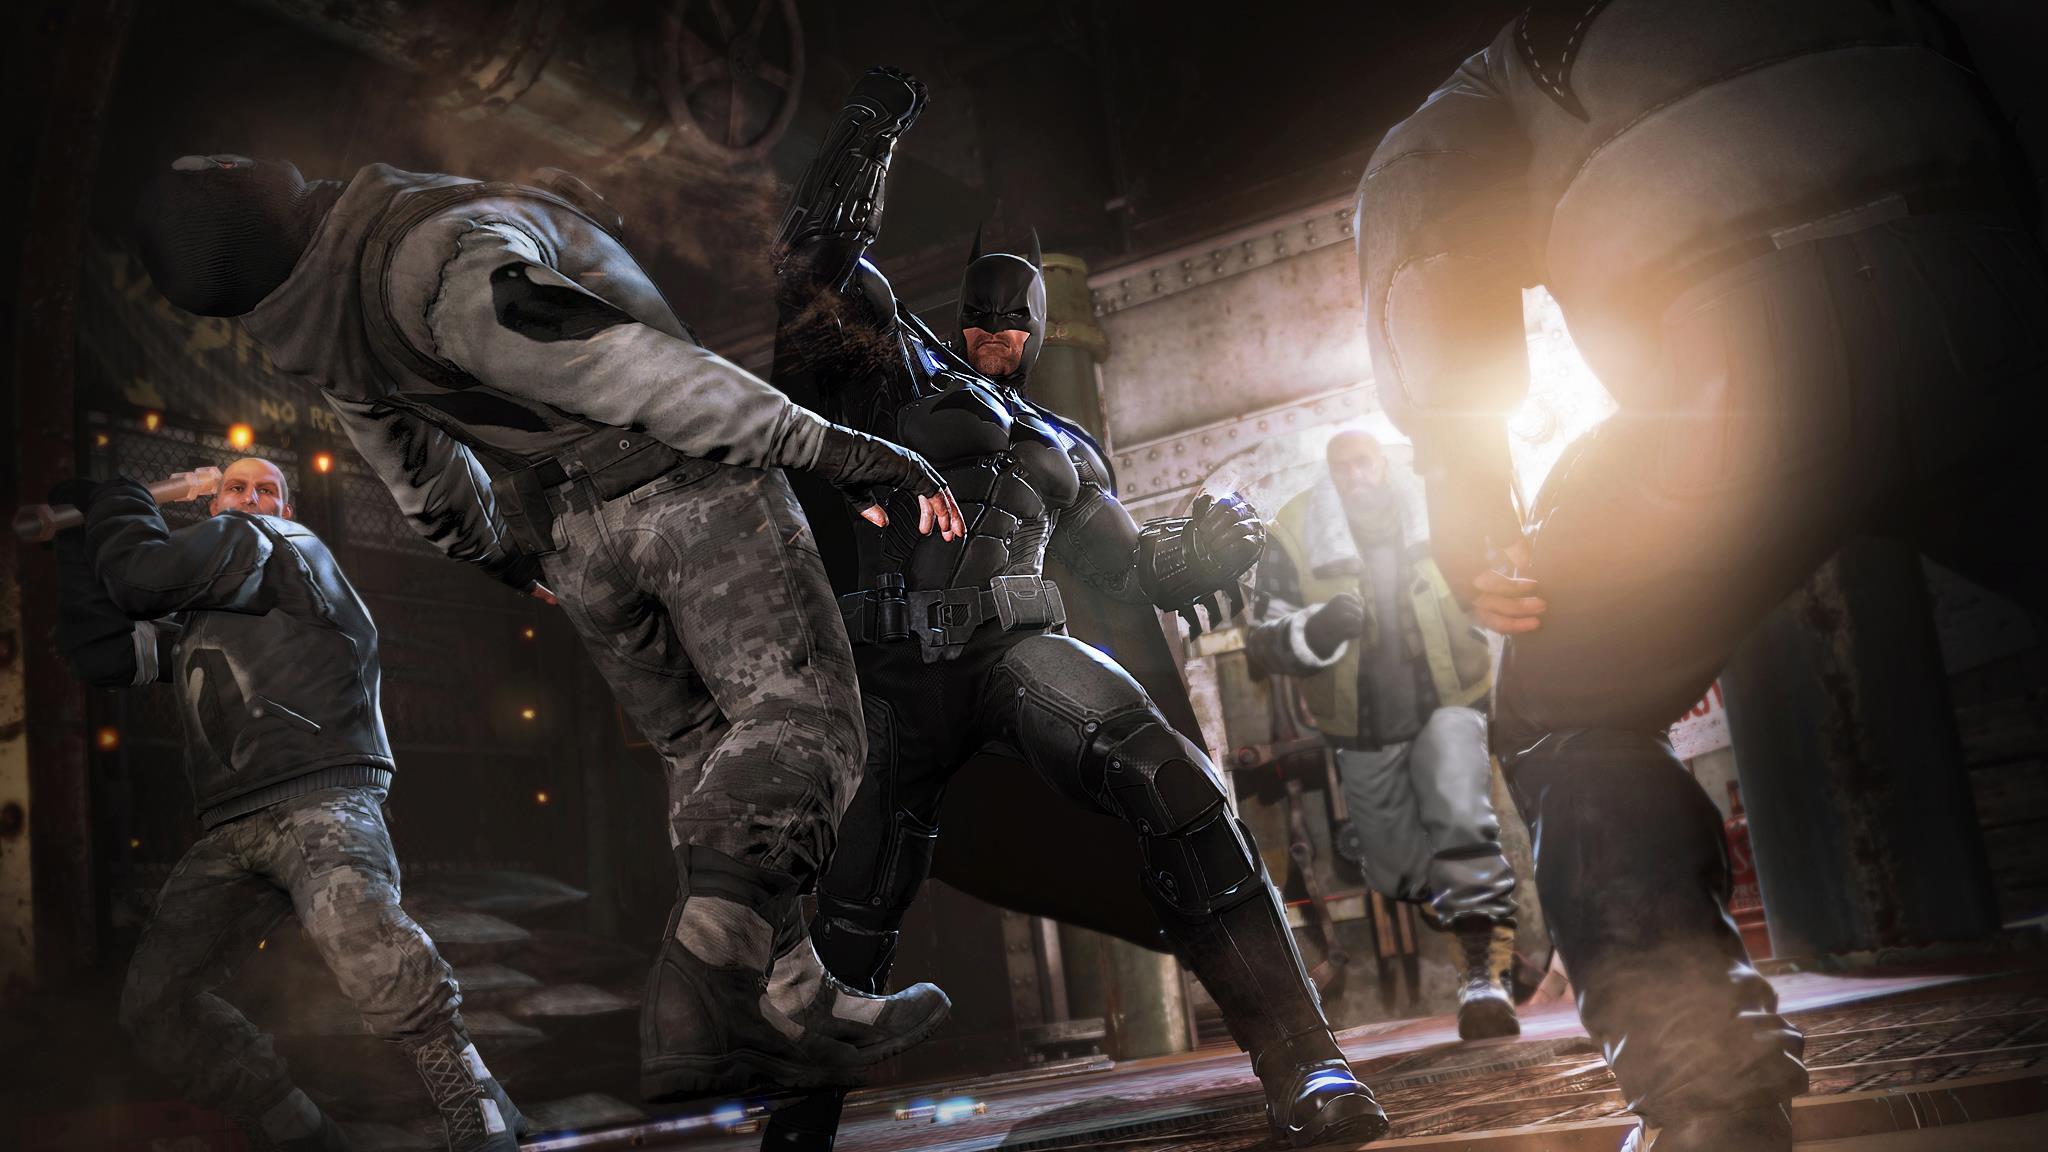 Tuna nových informací o Batman: Arkham Origins 80529